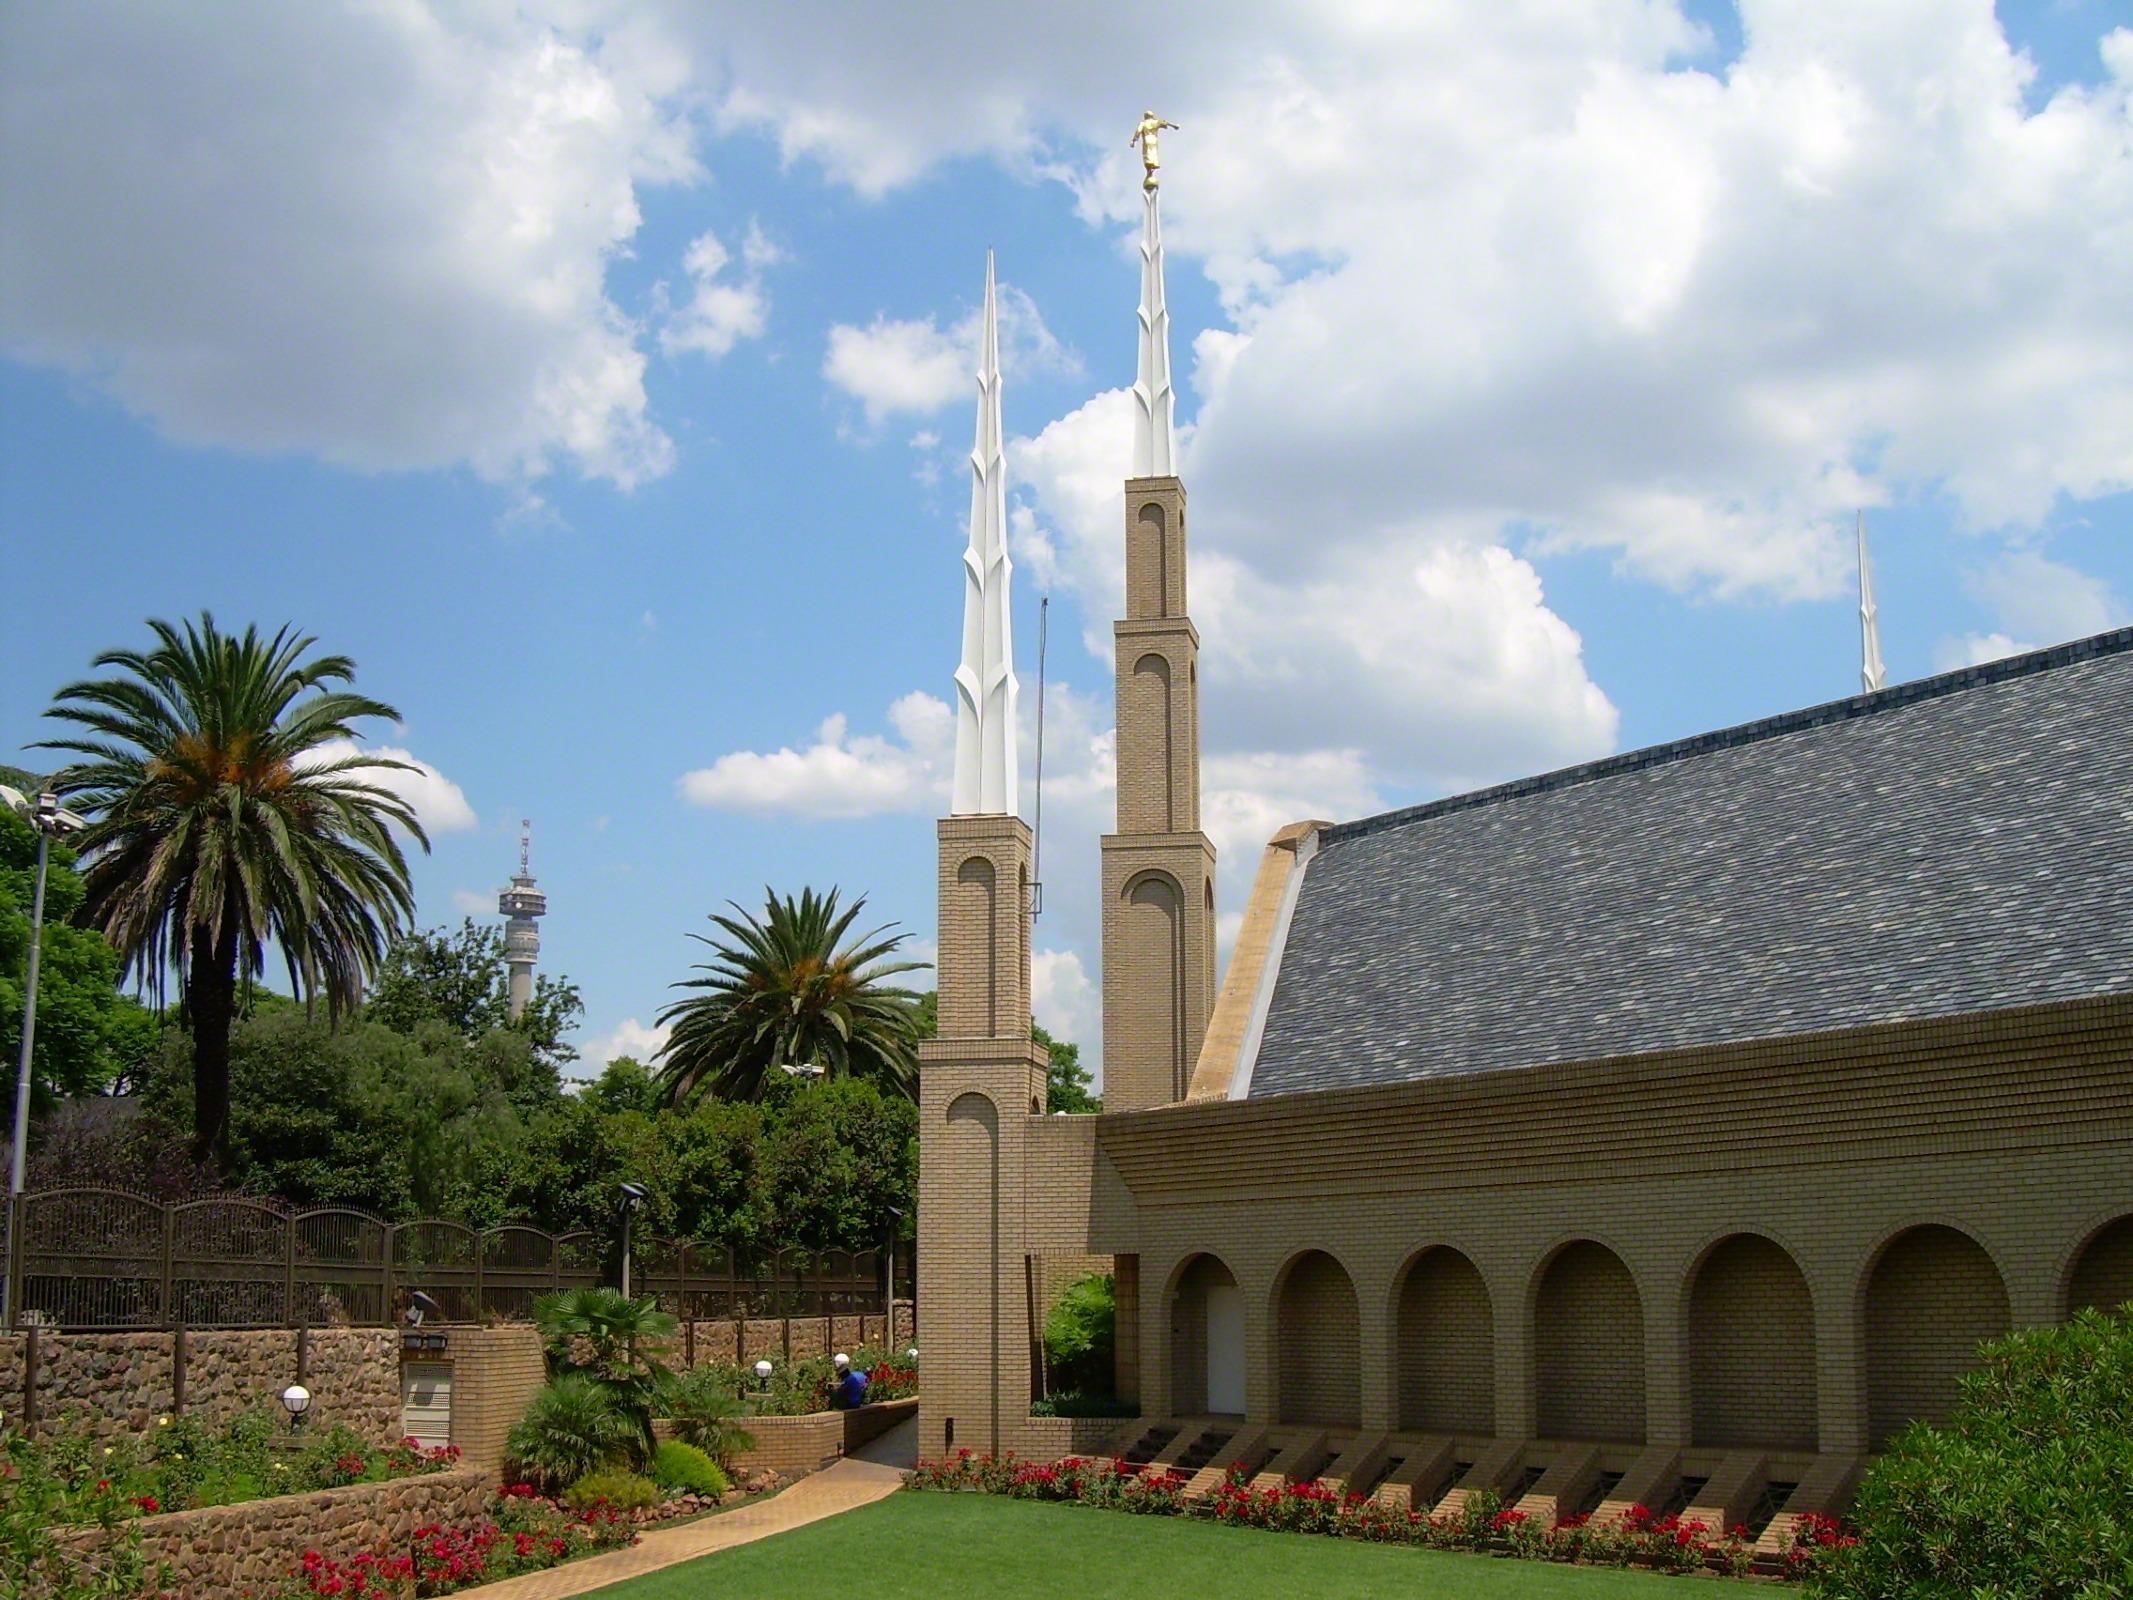 The johannesburg south africa temple altavistaventures Choice Image